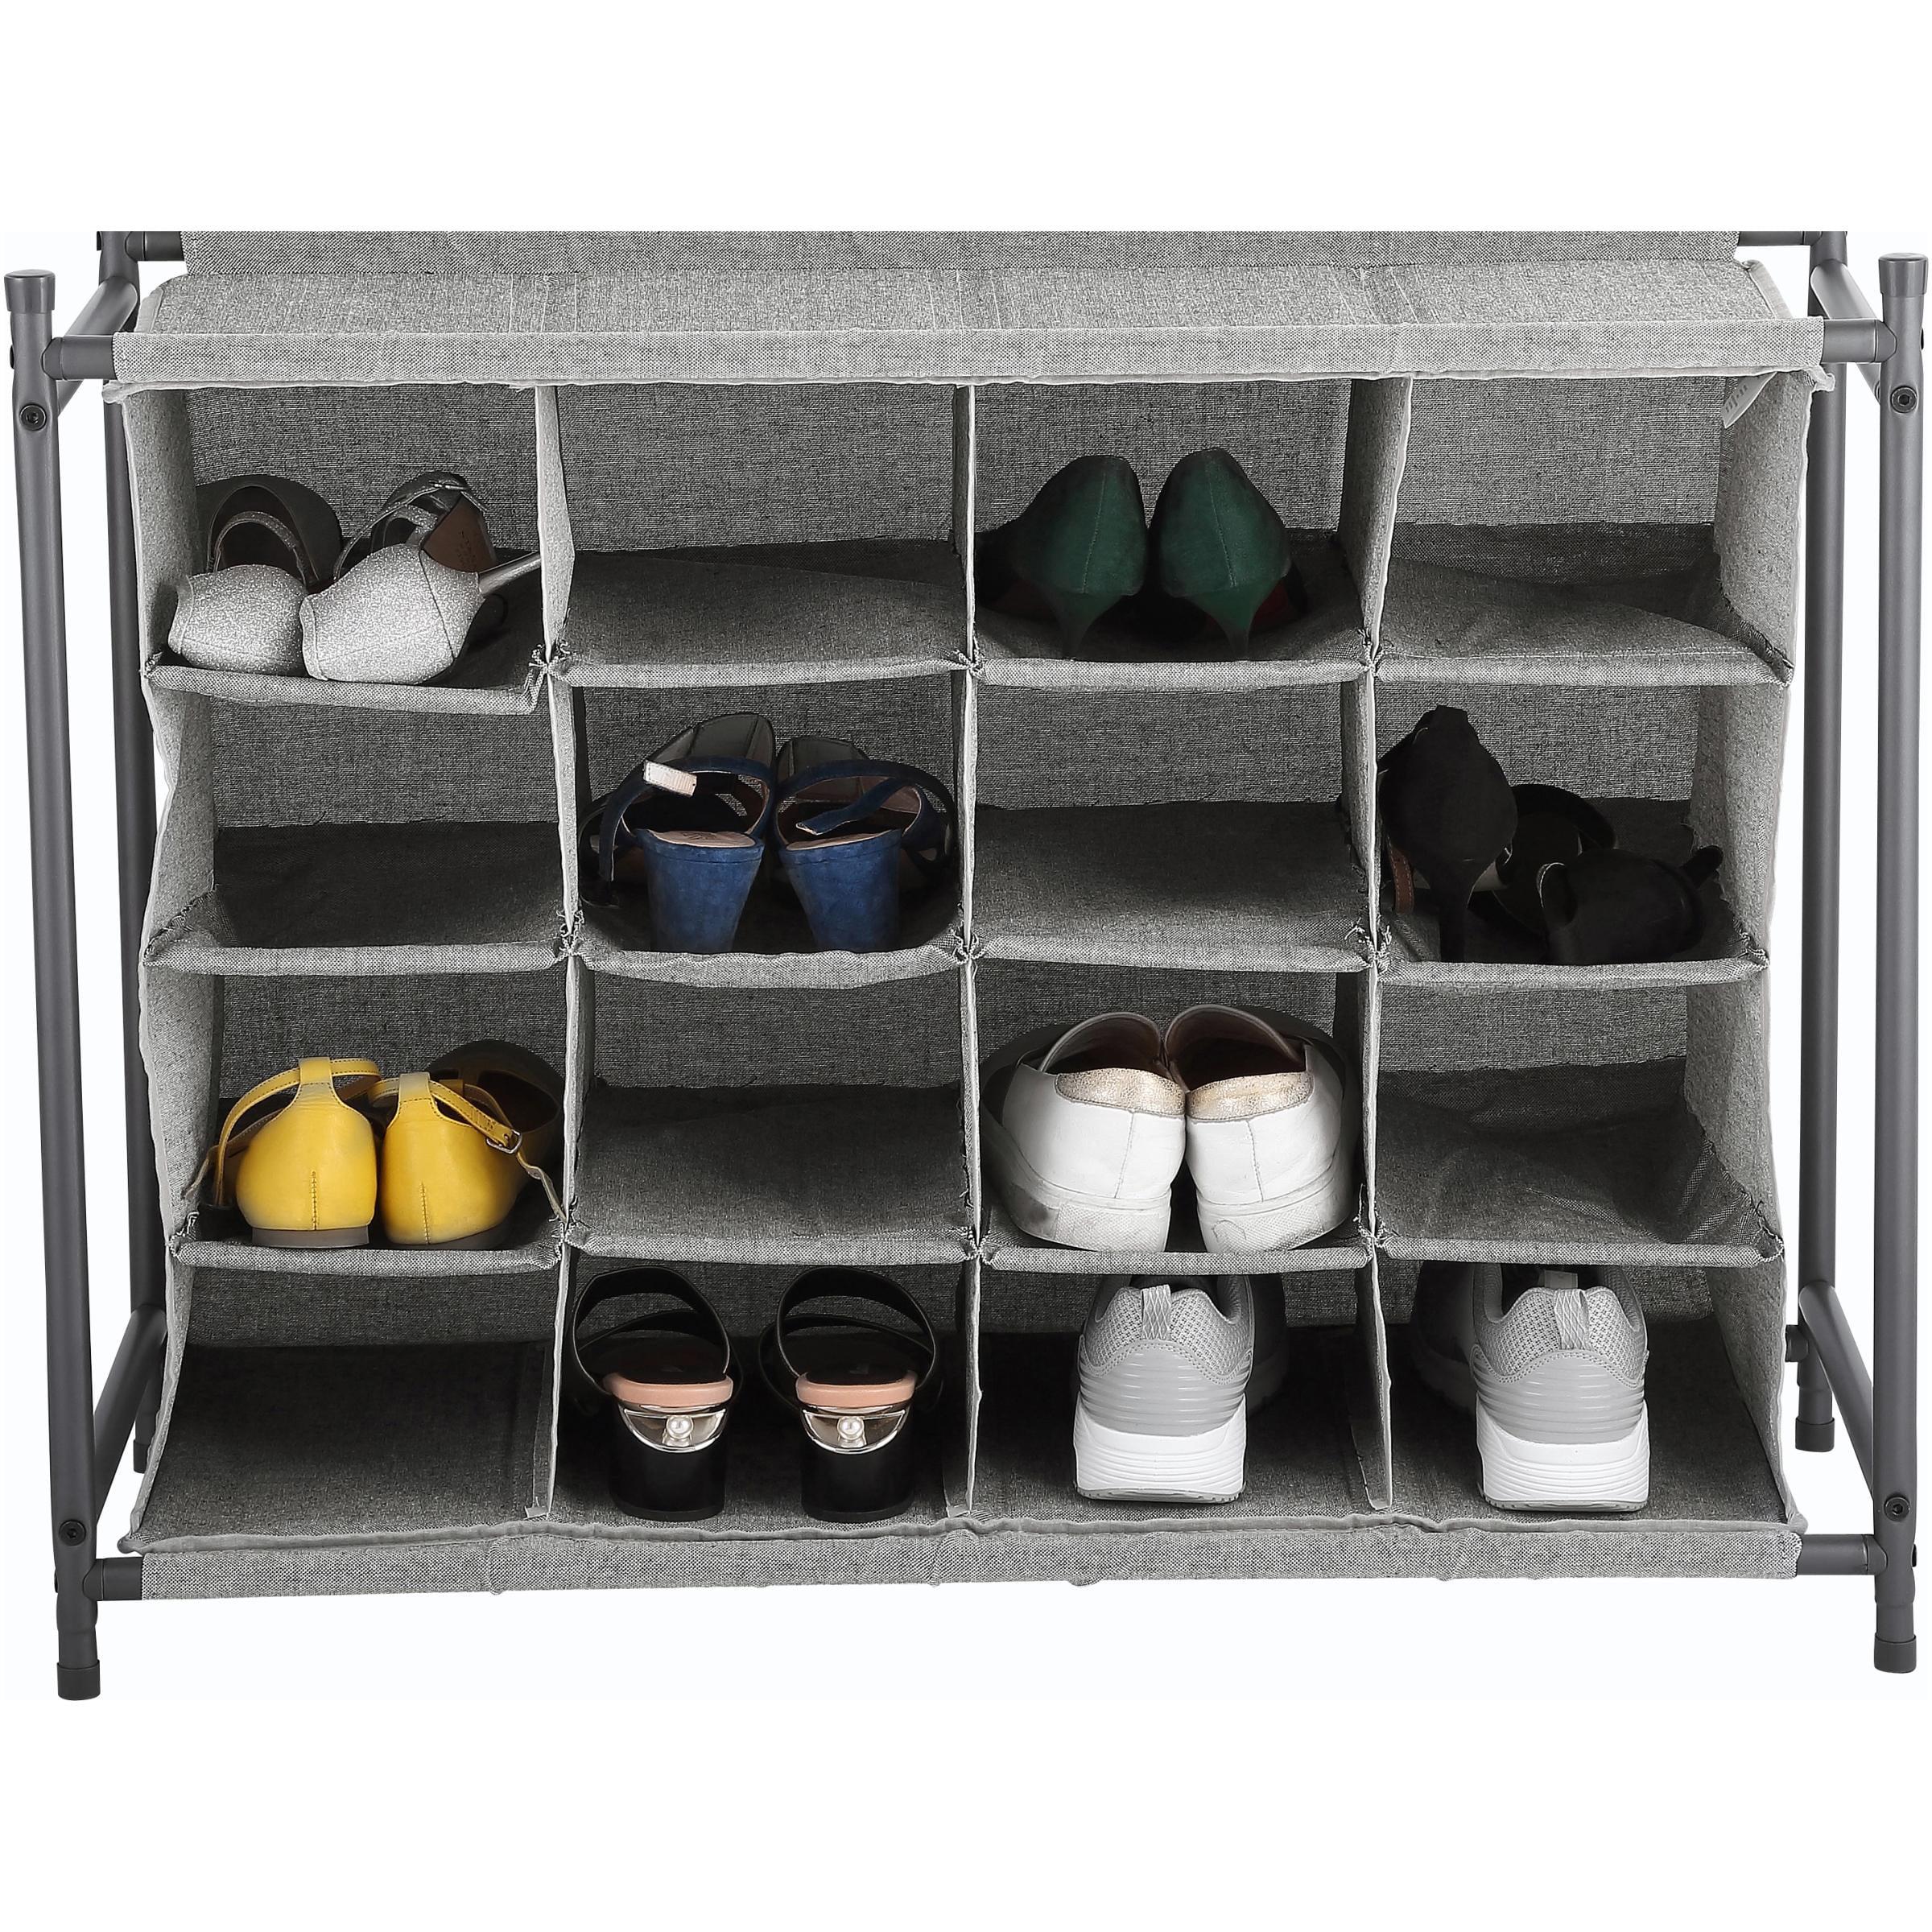 Shoe Racks - Walmart.com